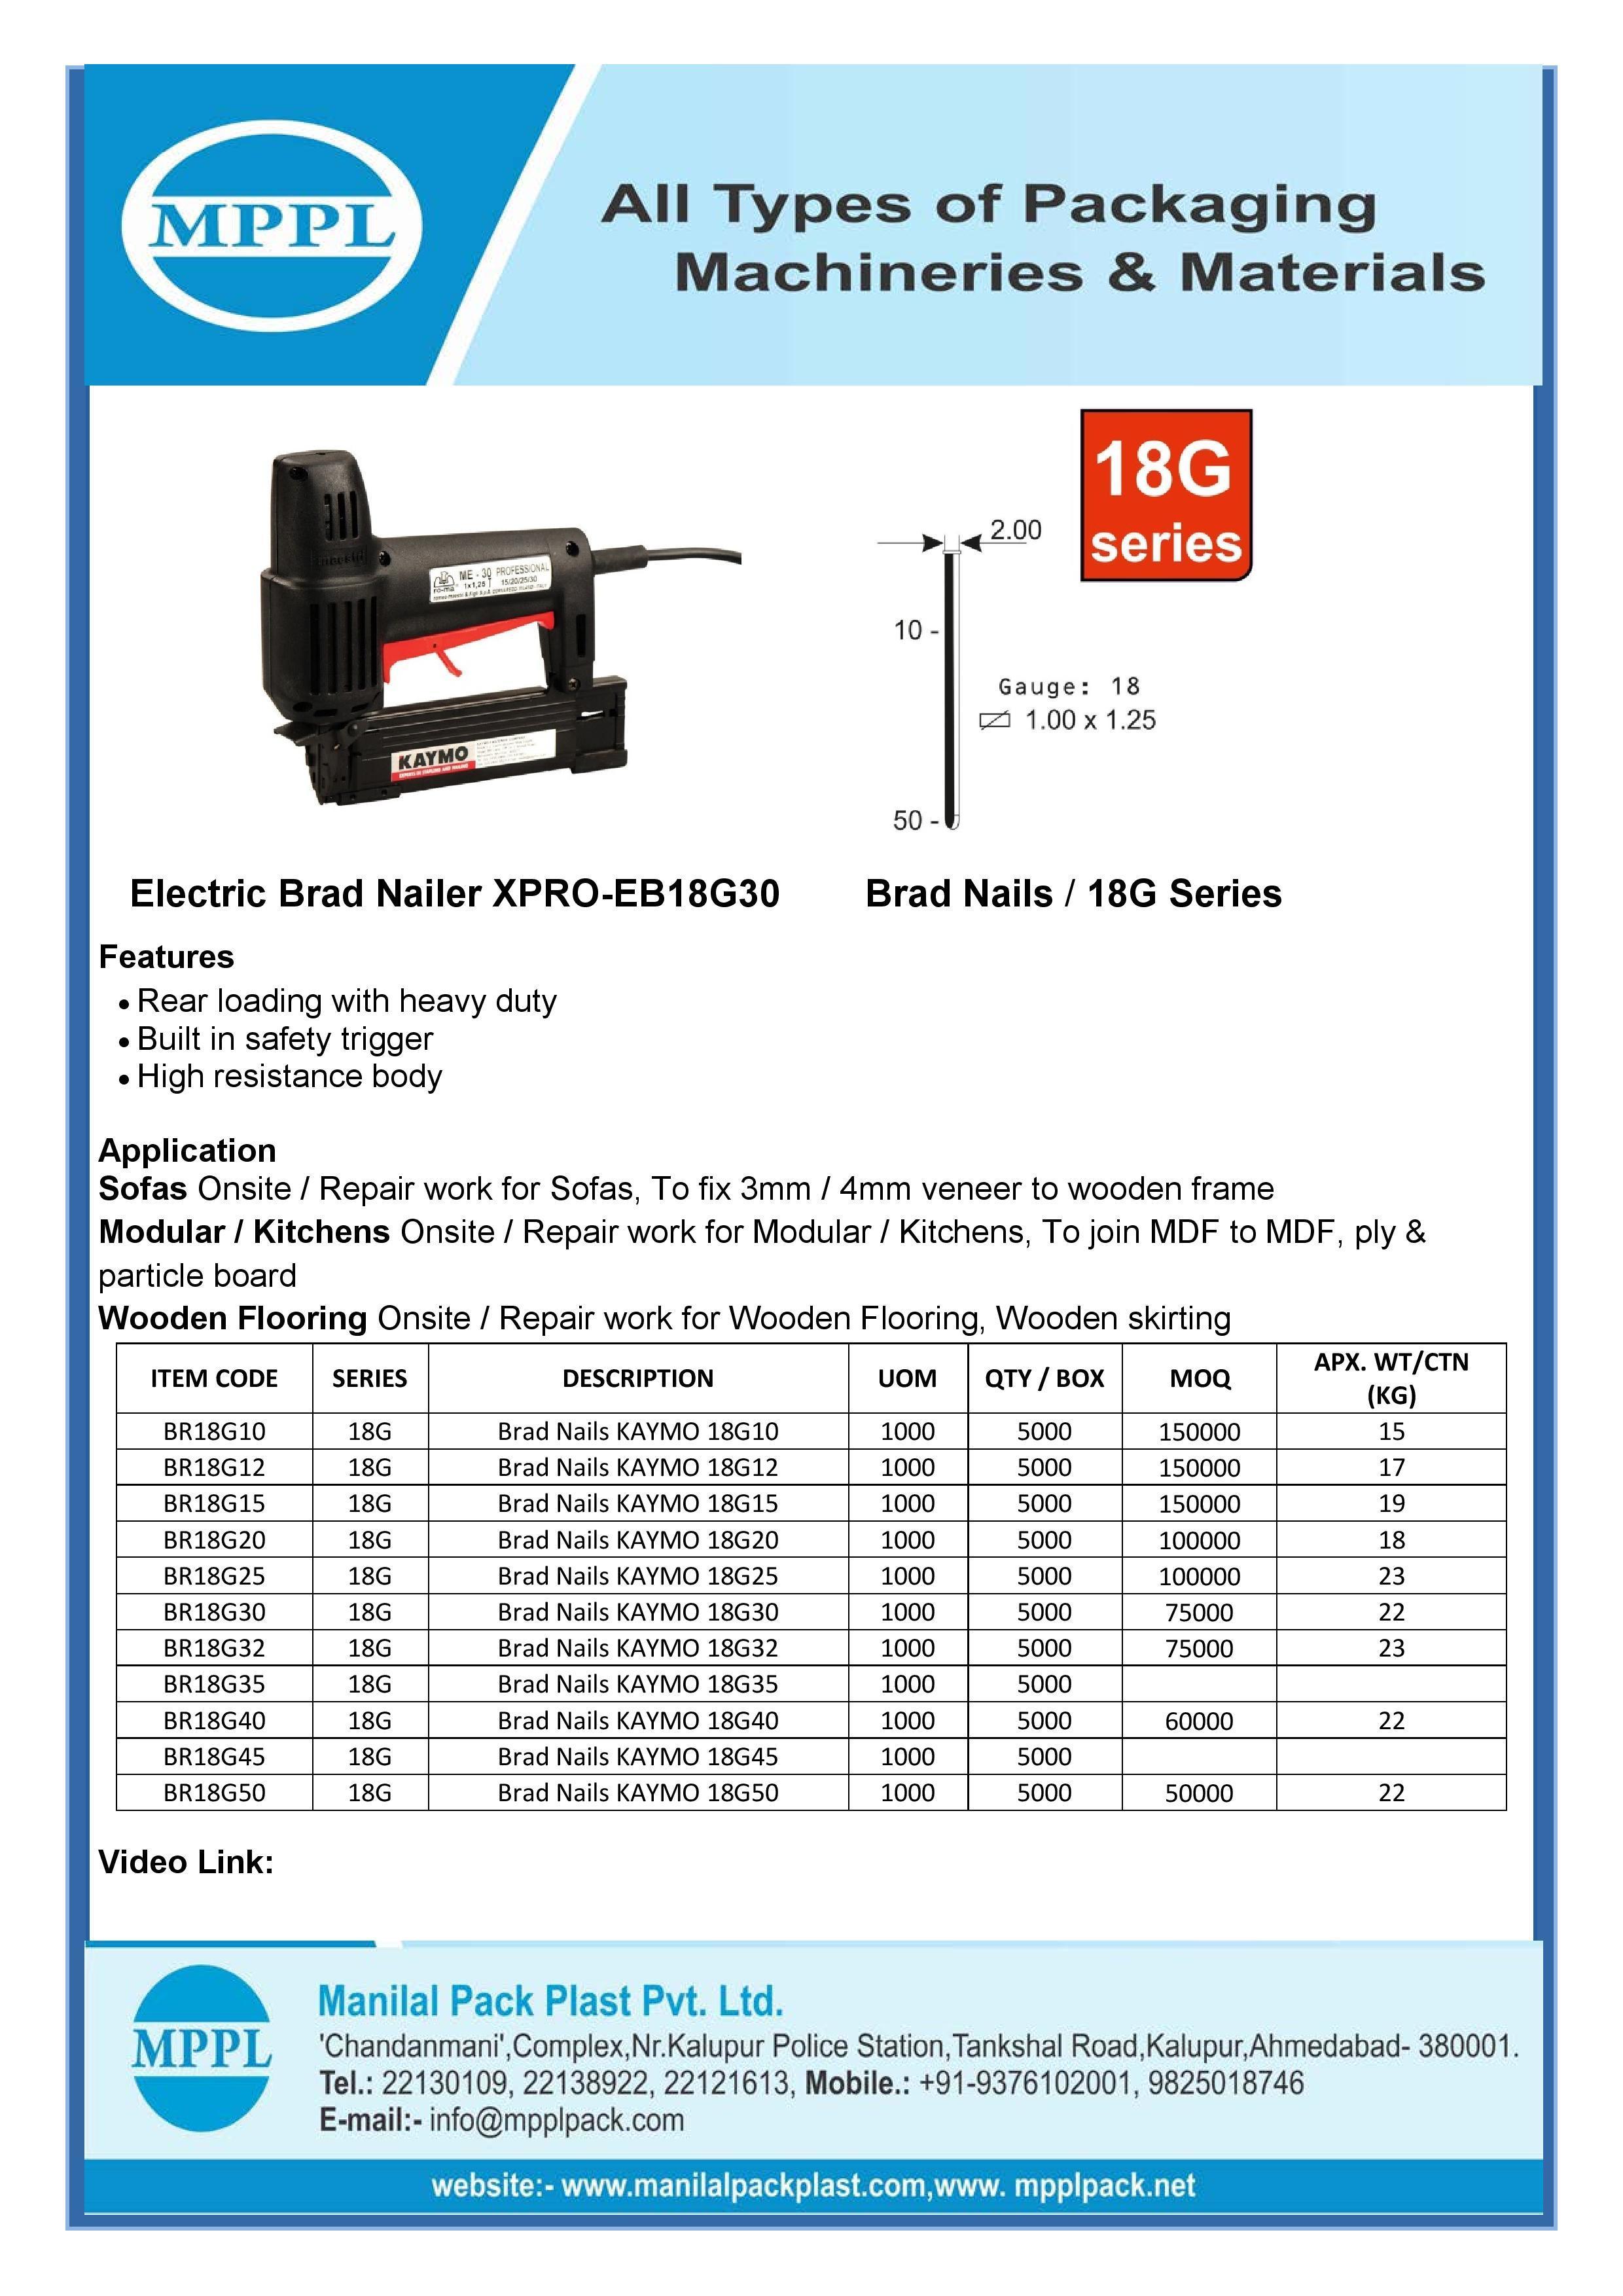 Electric Brad Nailer XPRO-EB18G30